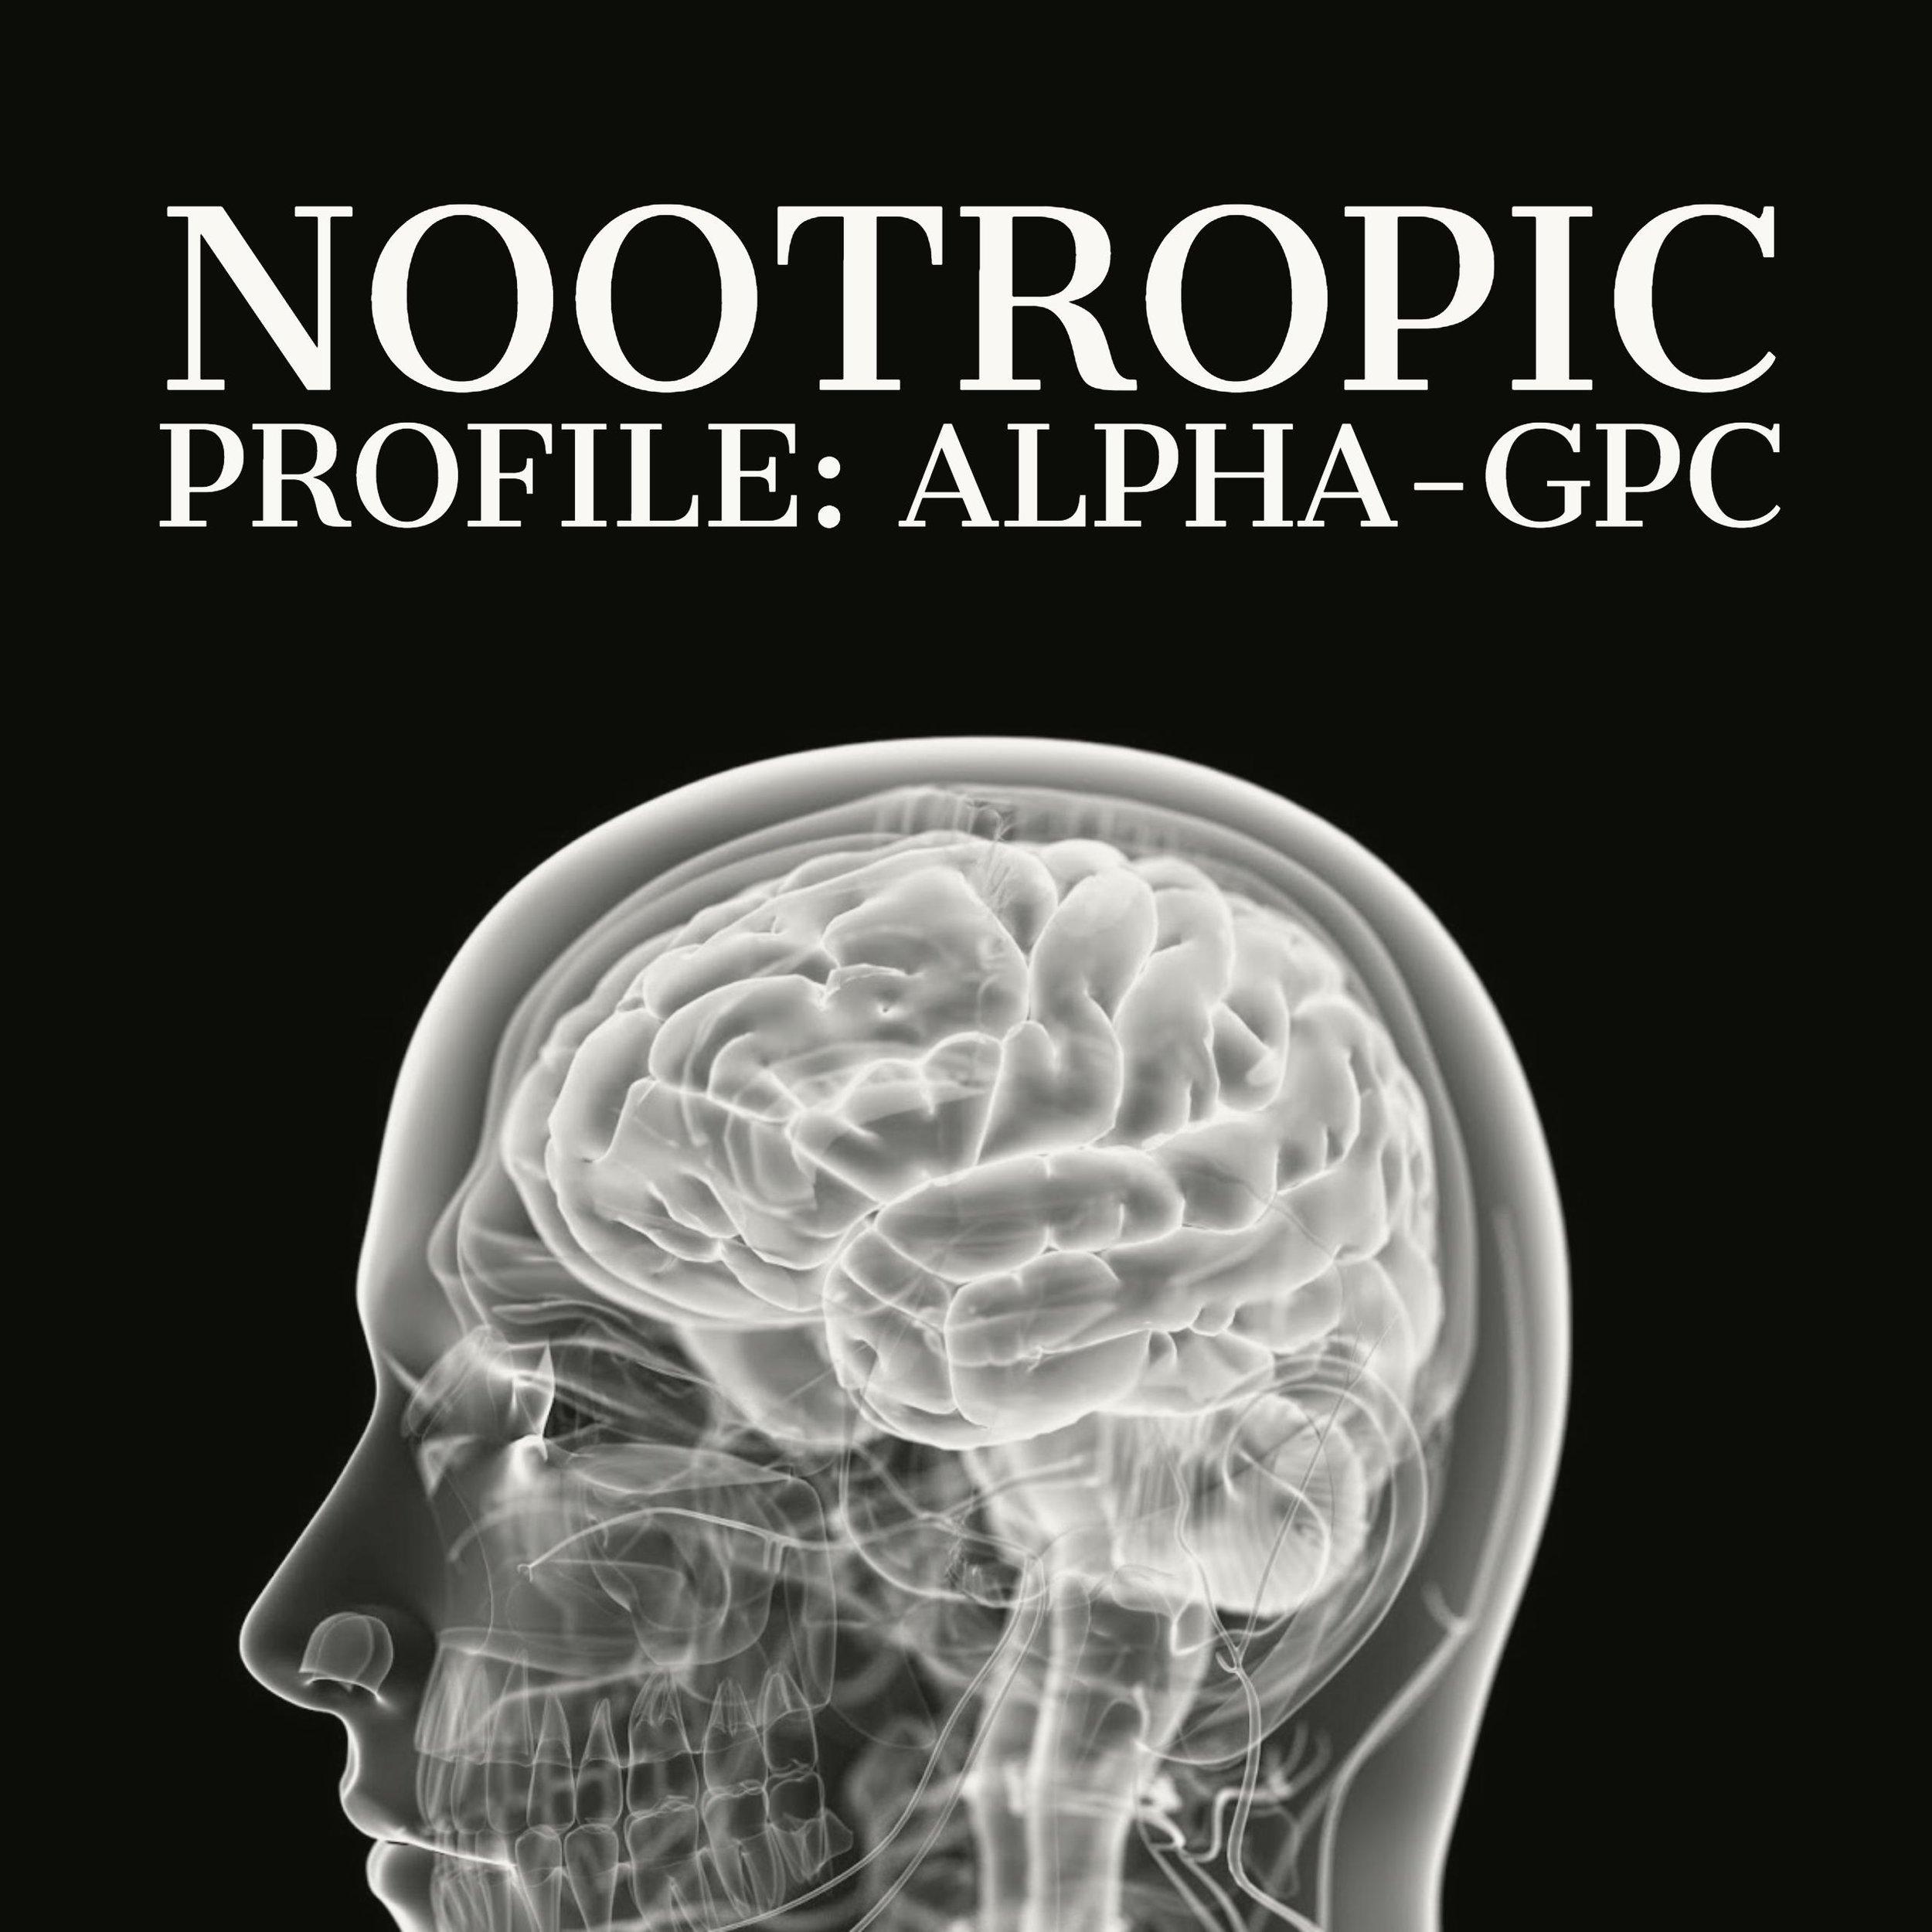 nootropic profile alpha gpc